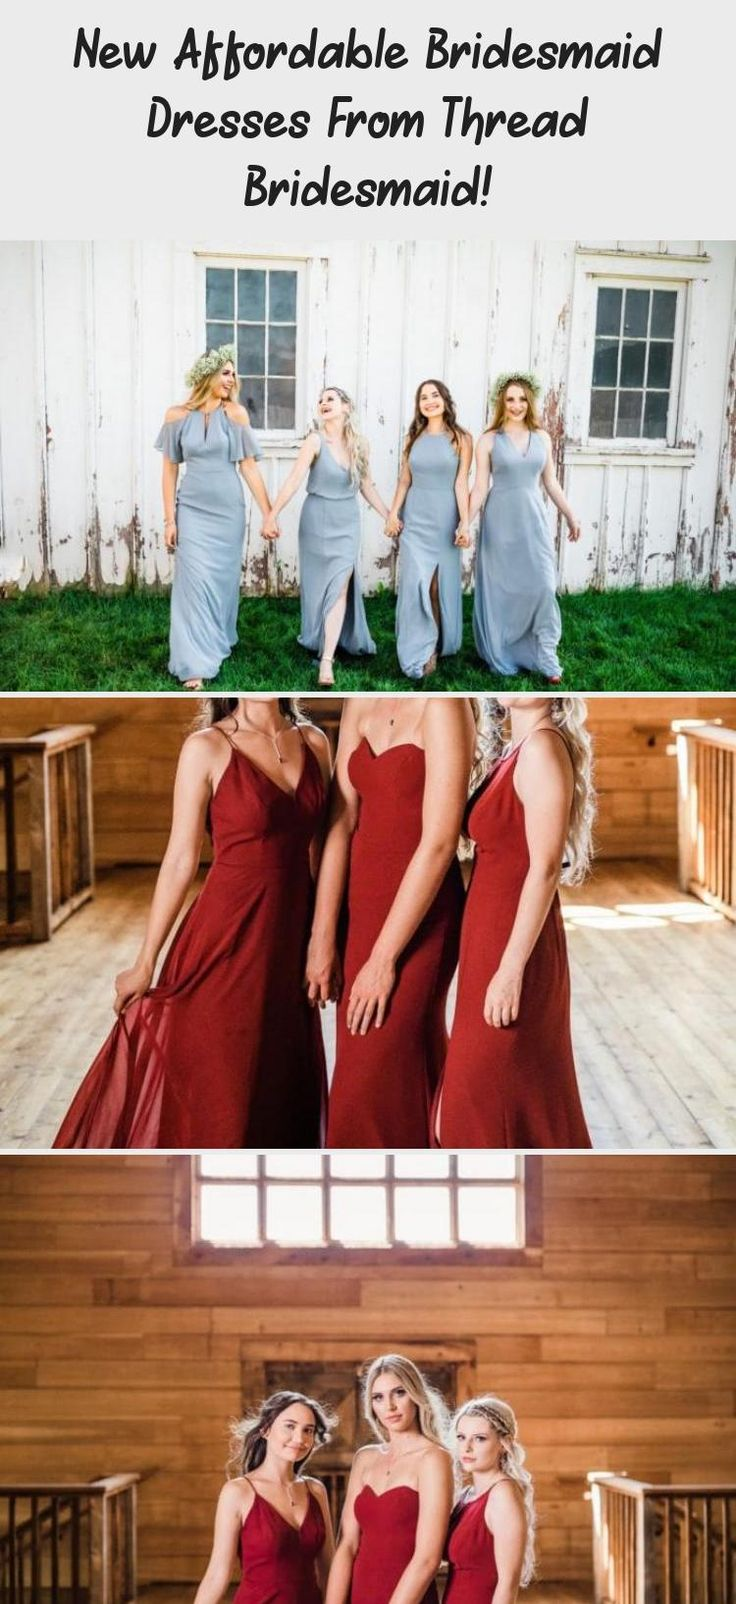 Light blue boho style affordable dresses for bridesmaids from Thread Bridesmaid! #bridesmaids #bridesmaid #bridesmaiddresses #LilacBridesmaidDresses #BridesmaidDressesNavy #SatinBridesmaidDresses #MaroonBridesmaidDresses #RedBridesmaidDresses